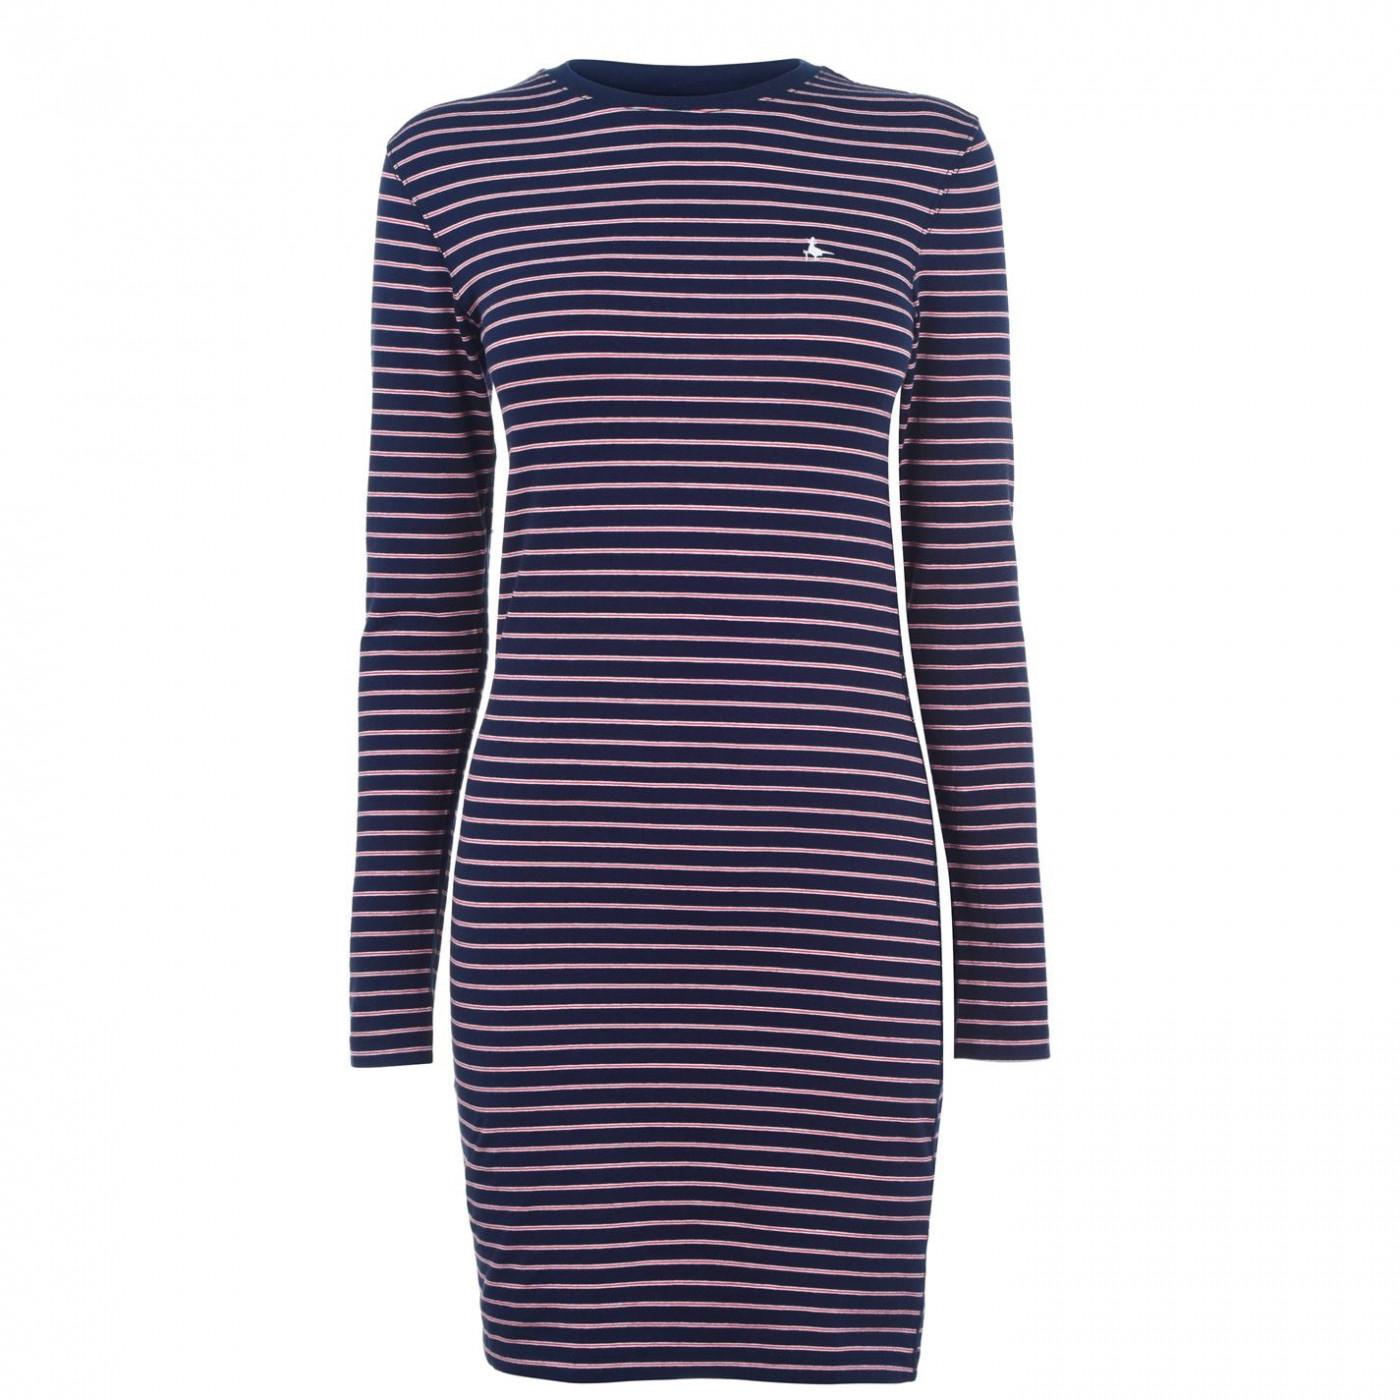 Jack Wills Capstaff Stripe Jersey Dress